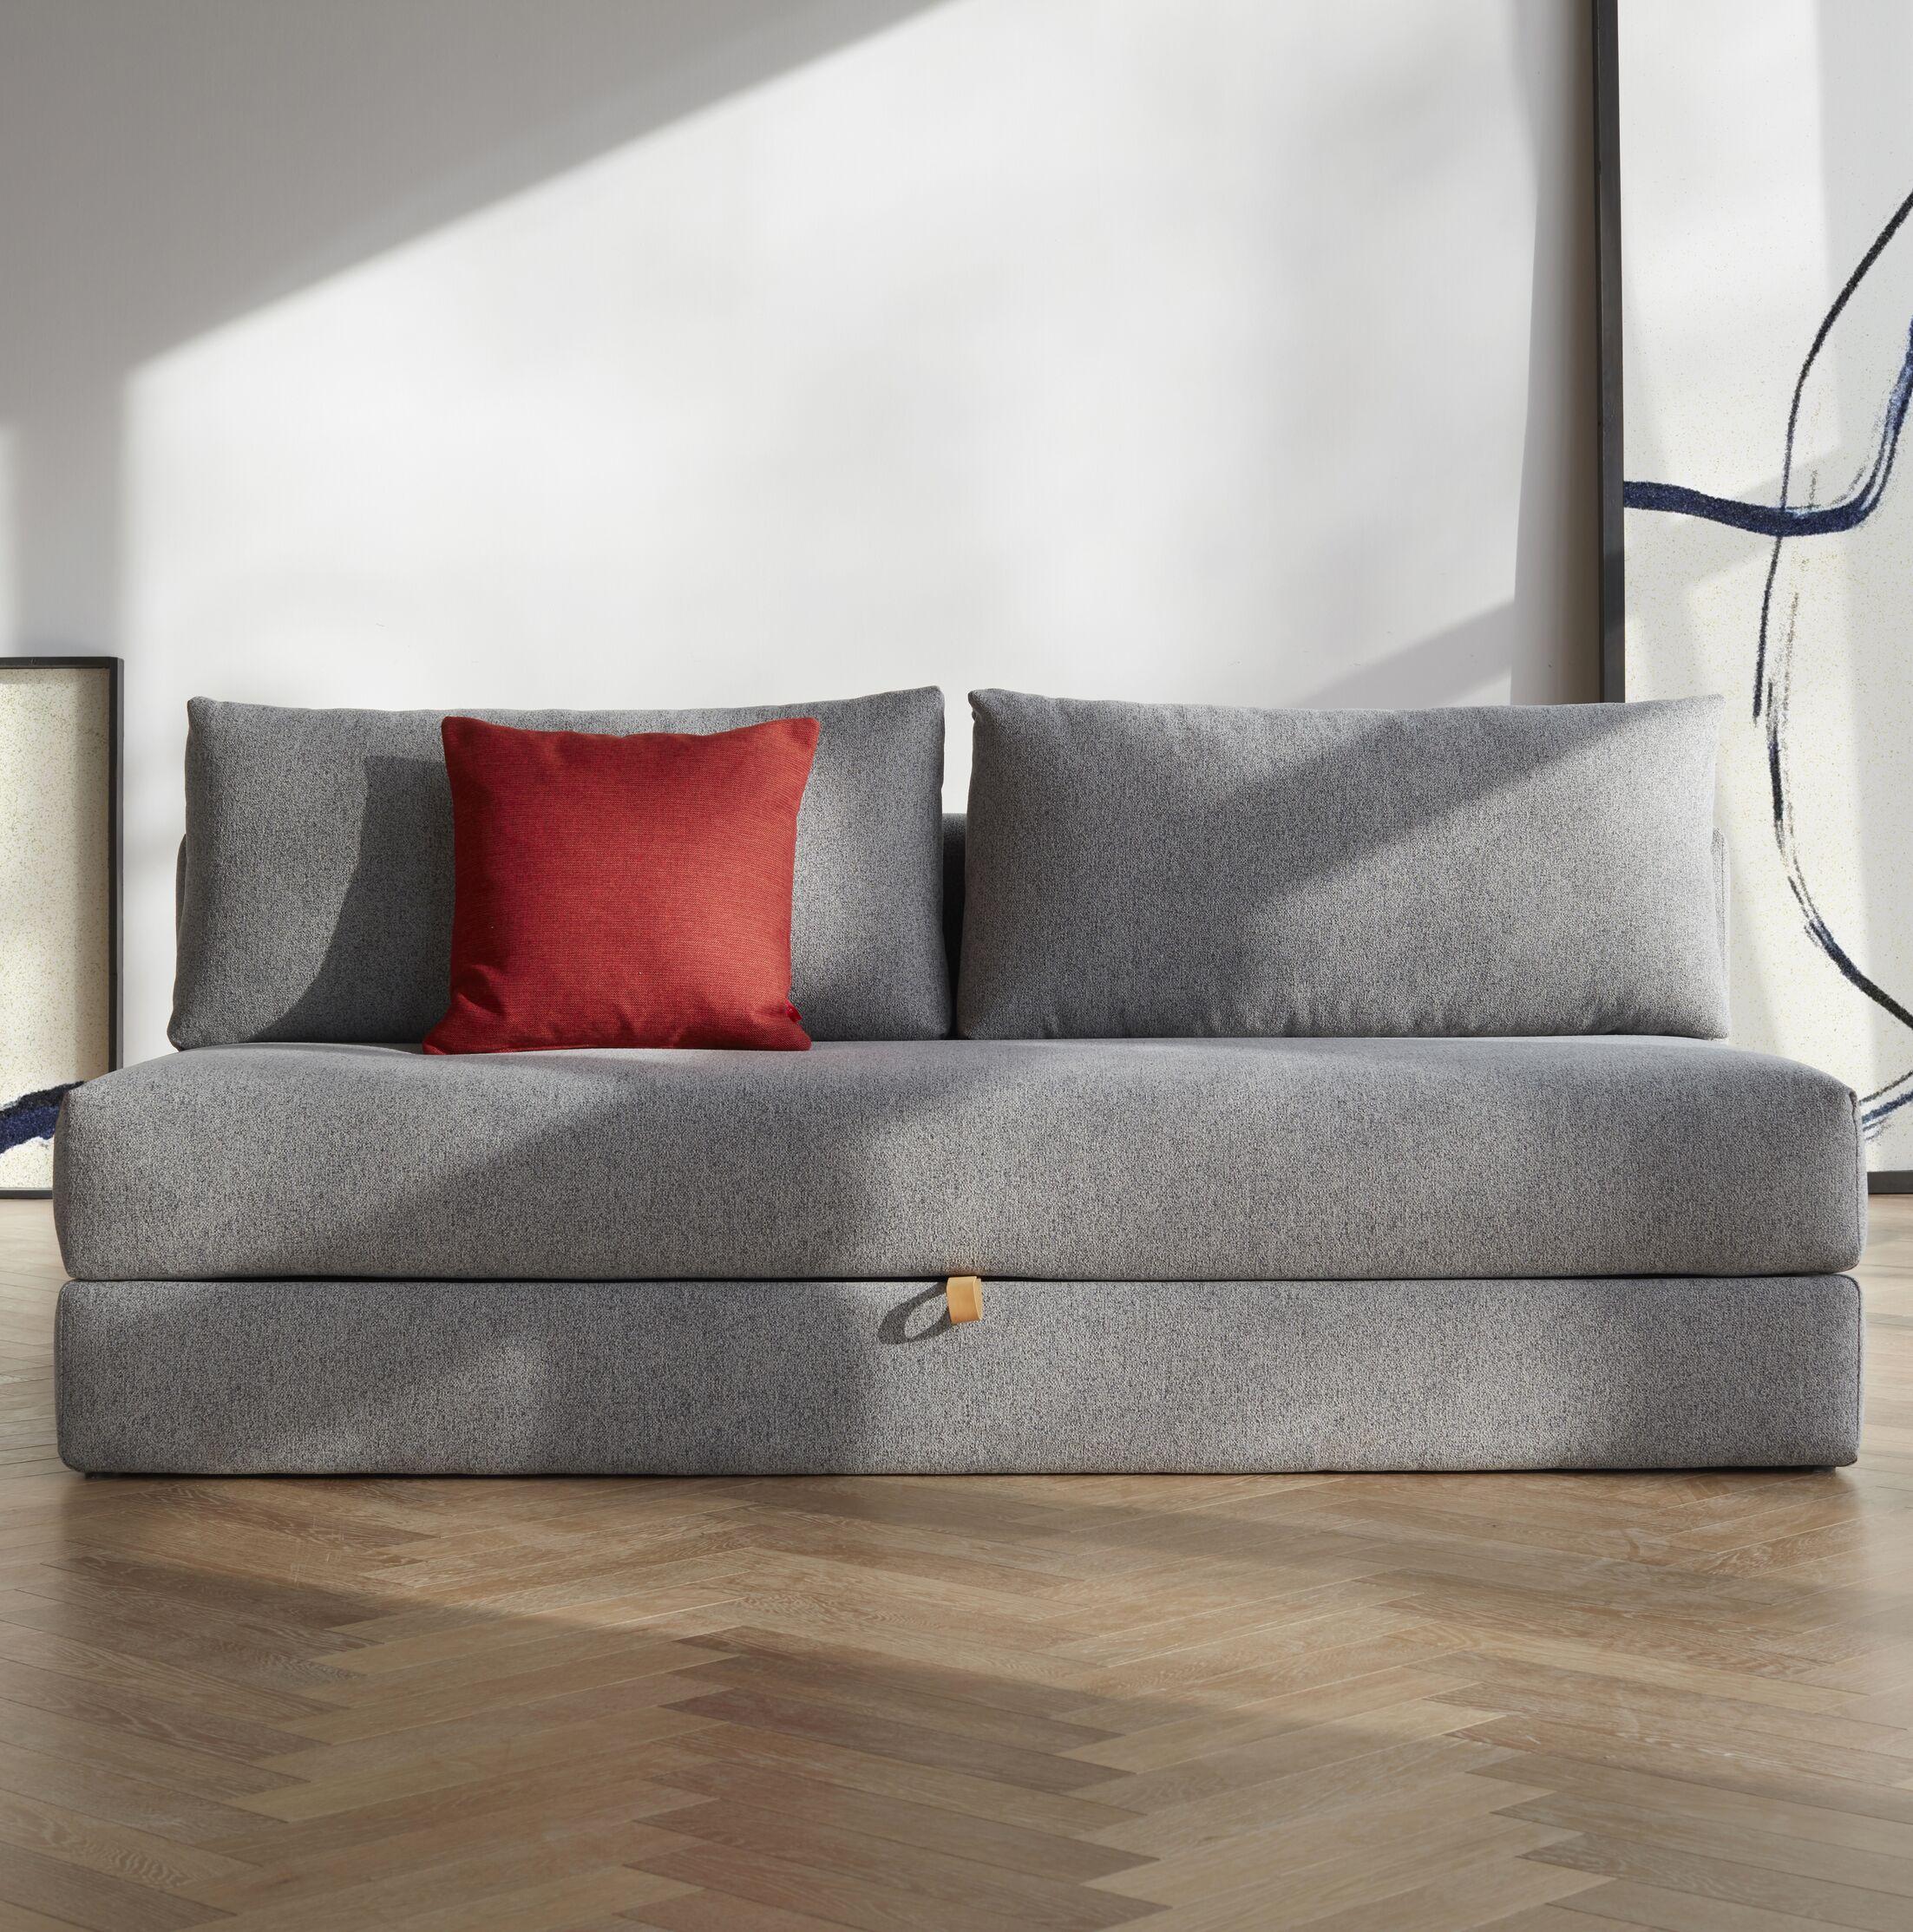 Osvald Sleek Sleeper Sofa